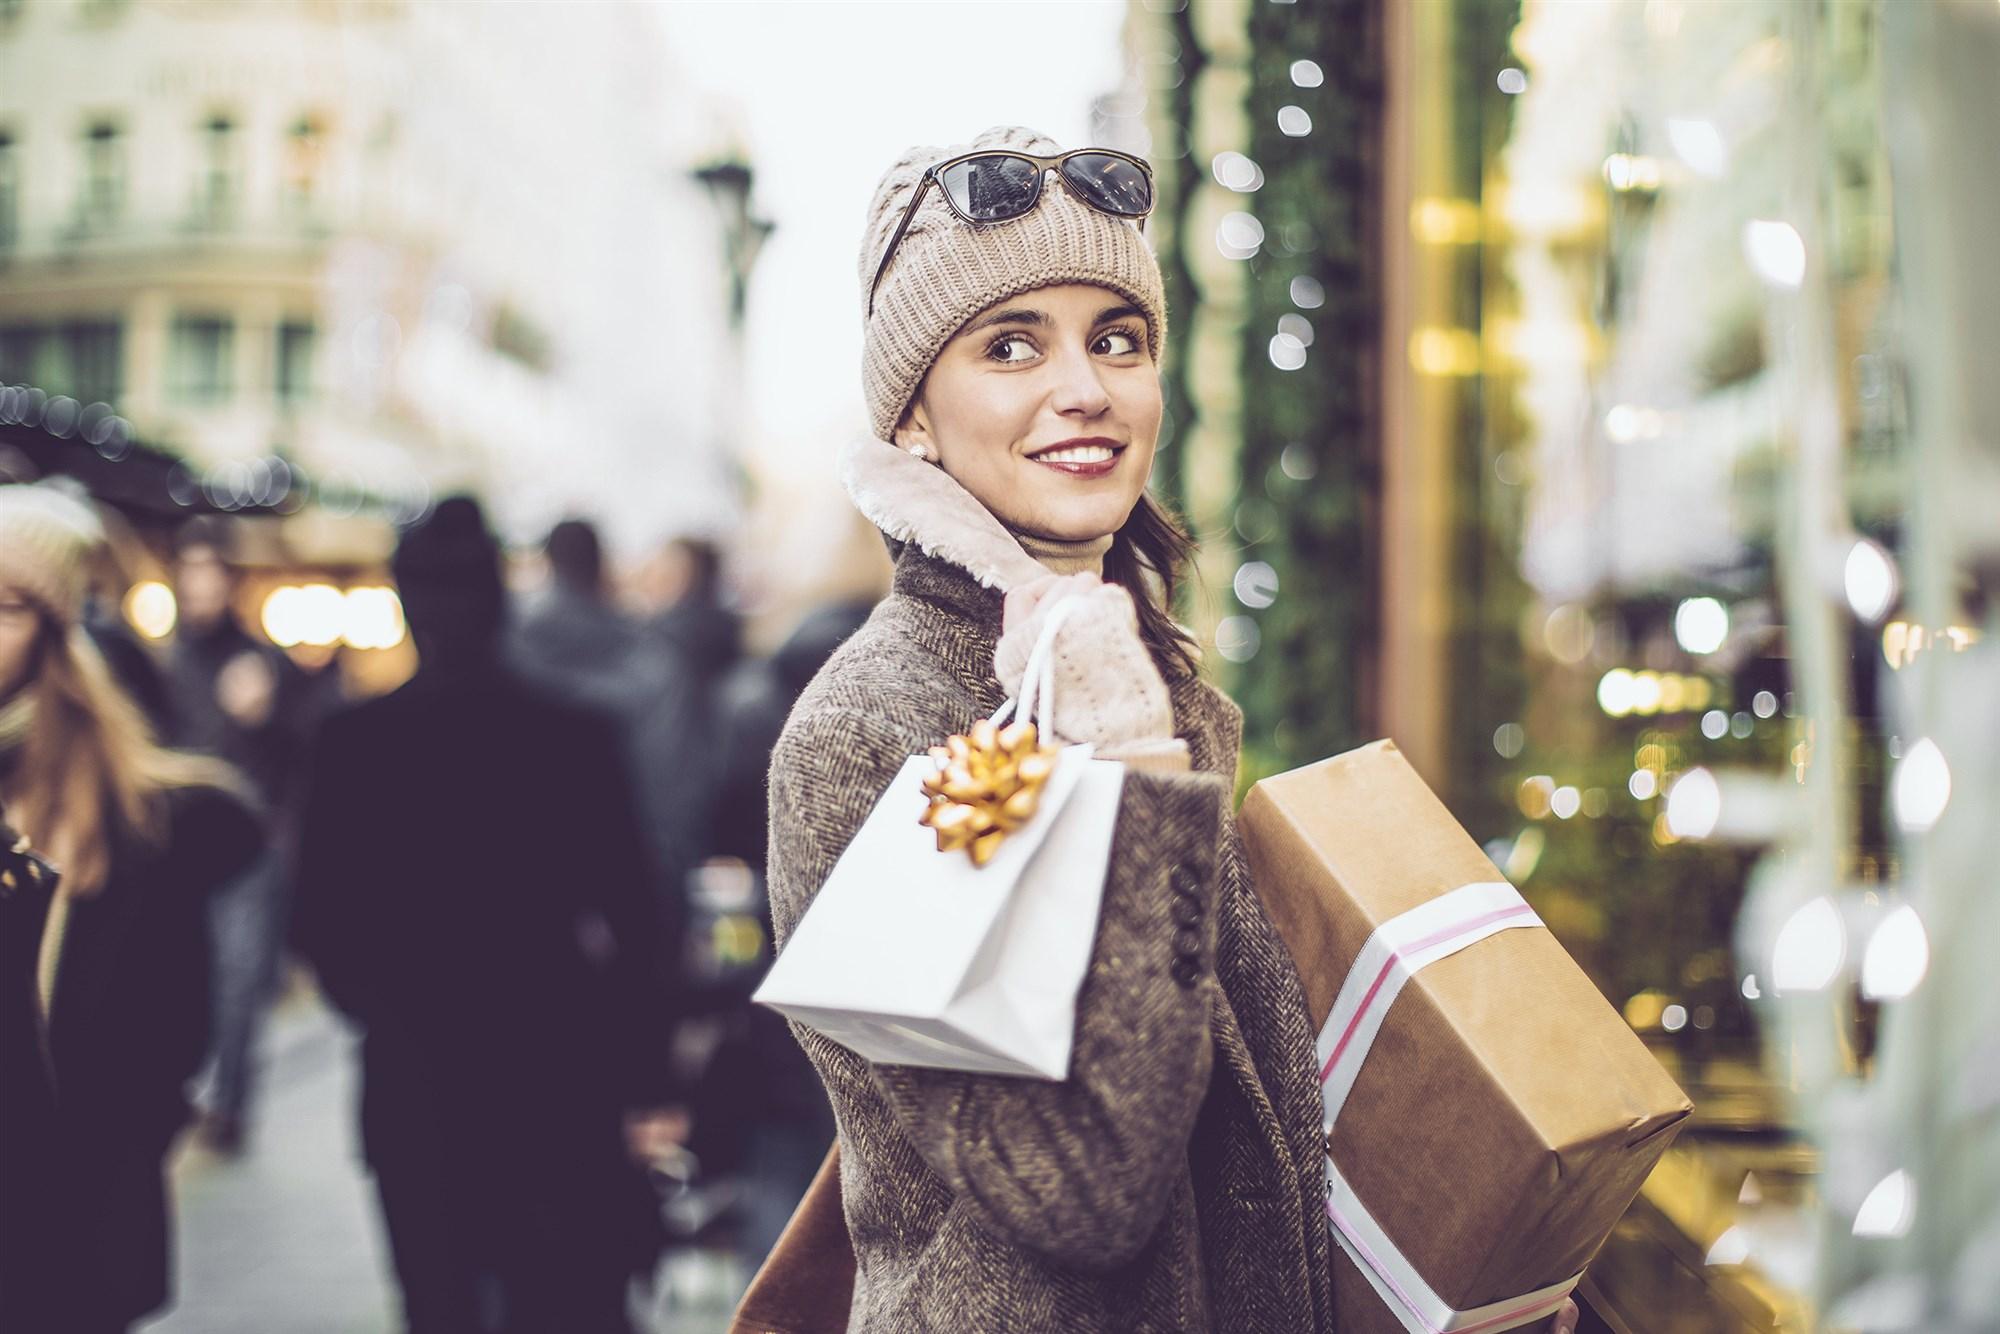 181204-woman-shopping-se-1246p_0d2498bc69ad10920eac1d990fc1ae80.fit-2000w.jpg